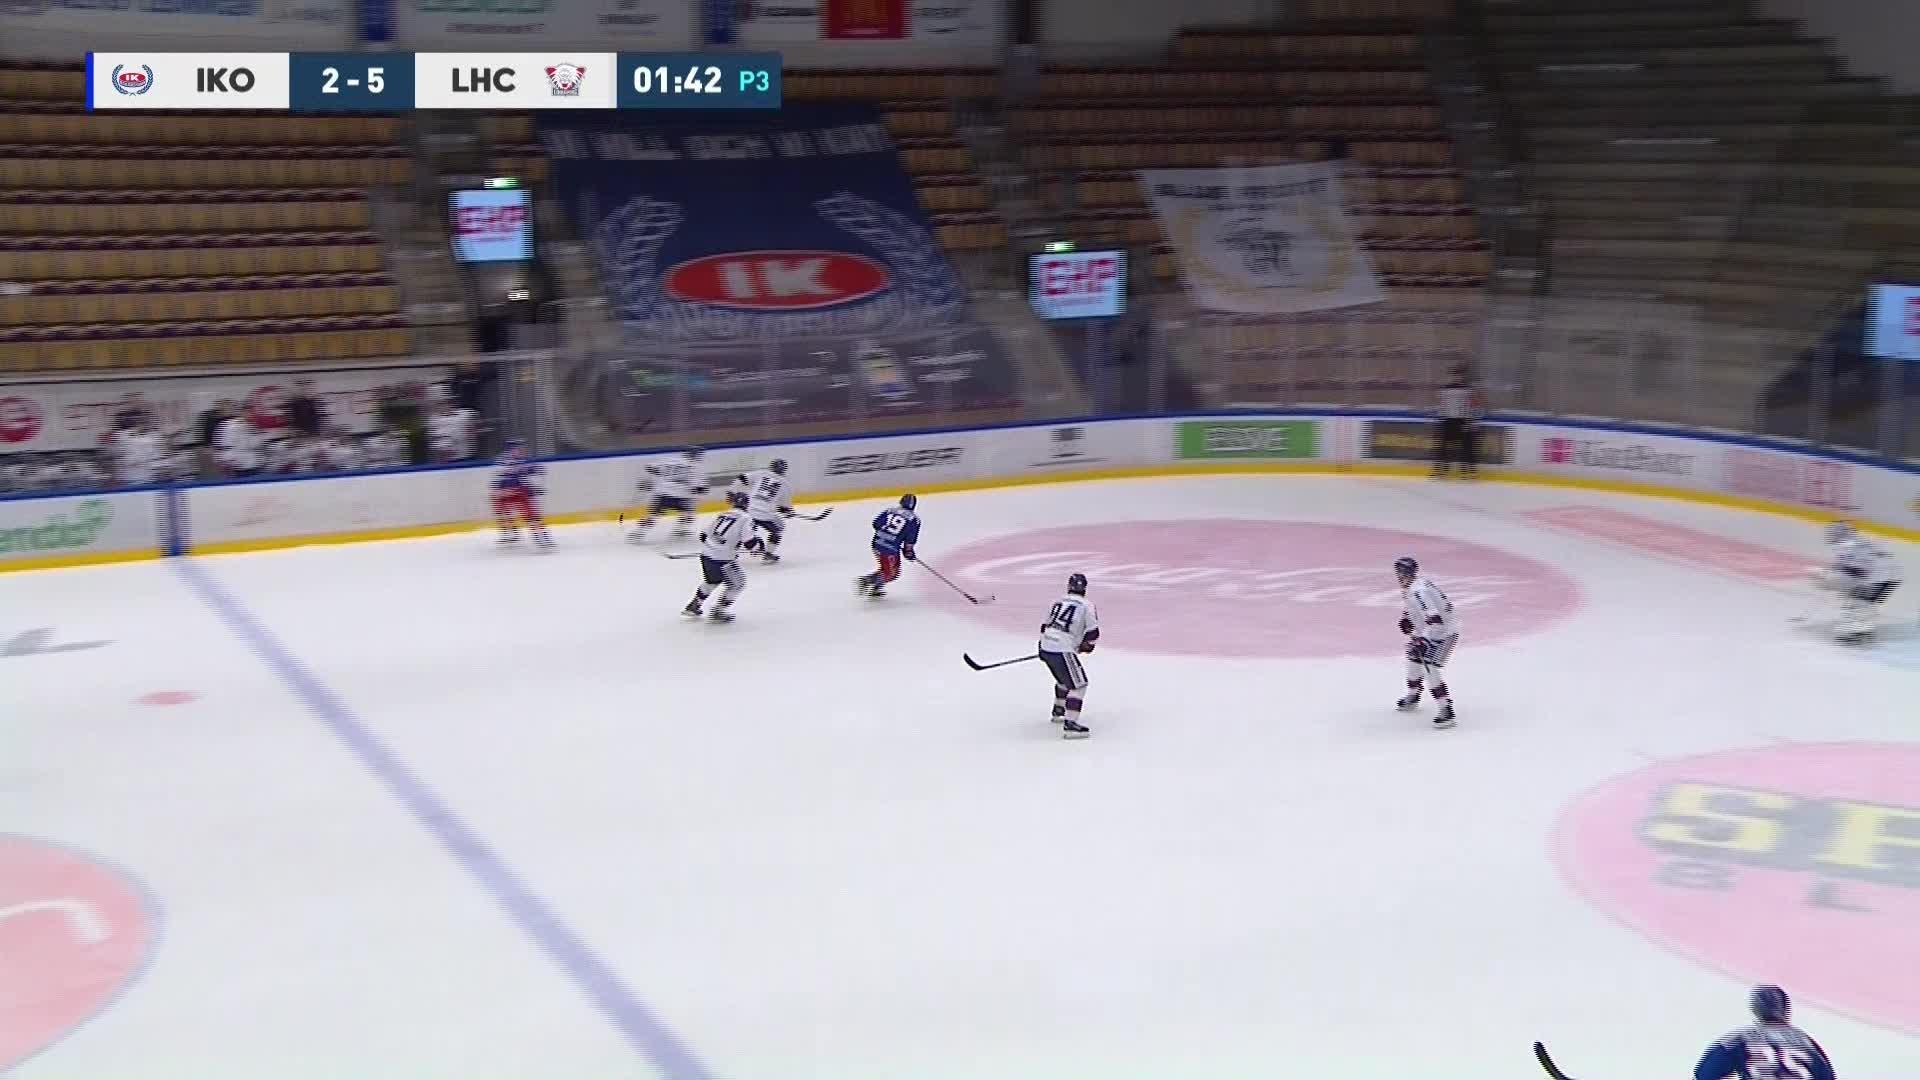 IK Oskarshamn - Linköping HC 3-5